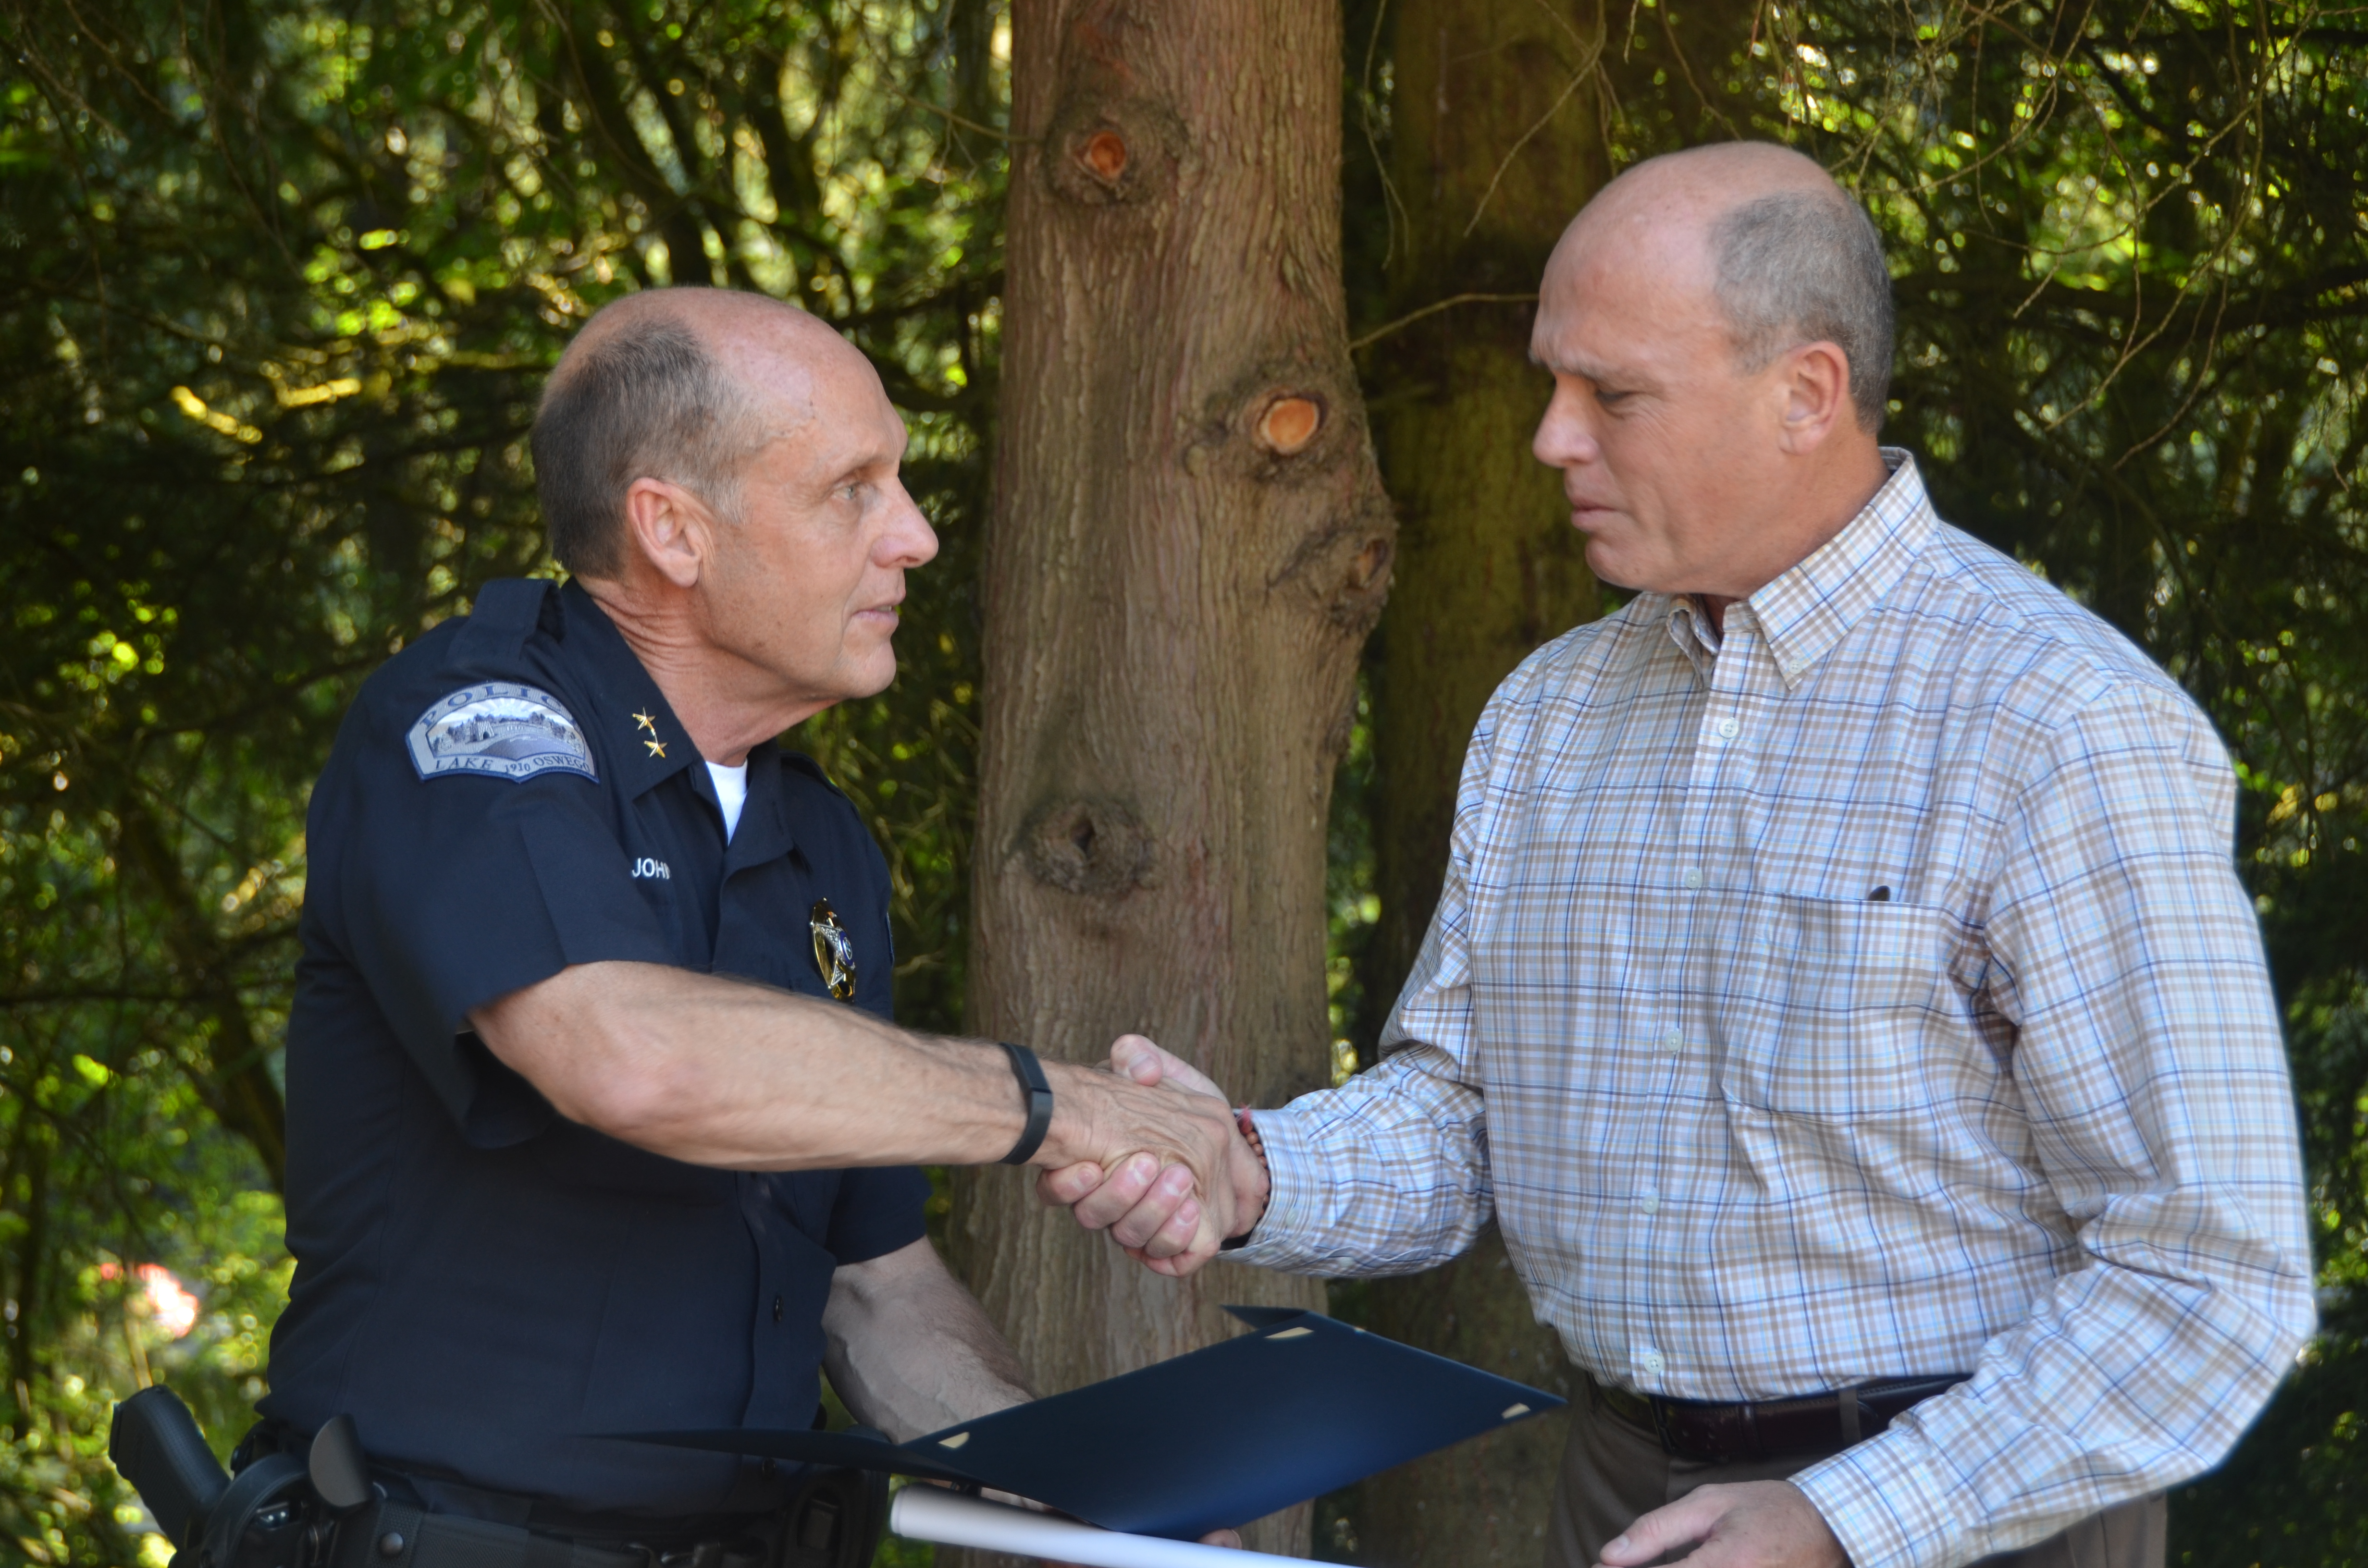 Chief shakes Leonard's hand